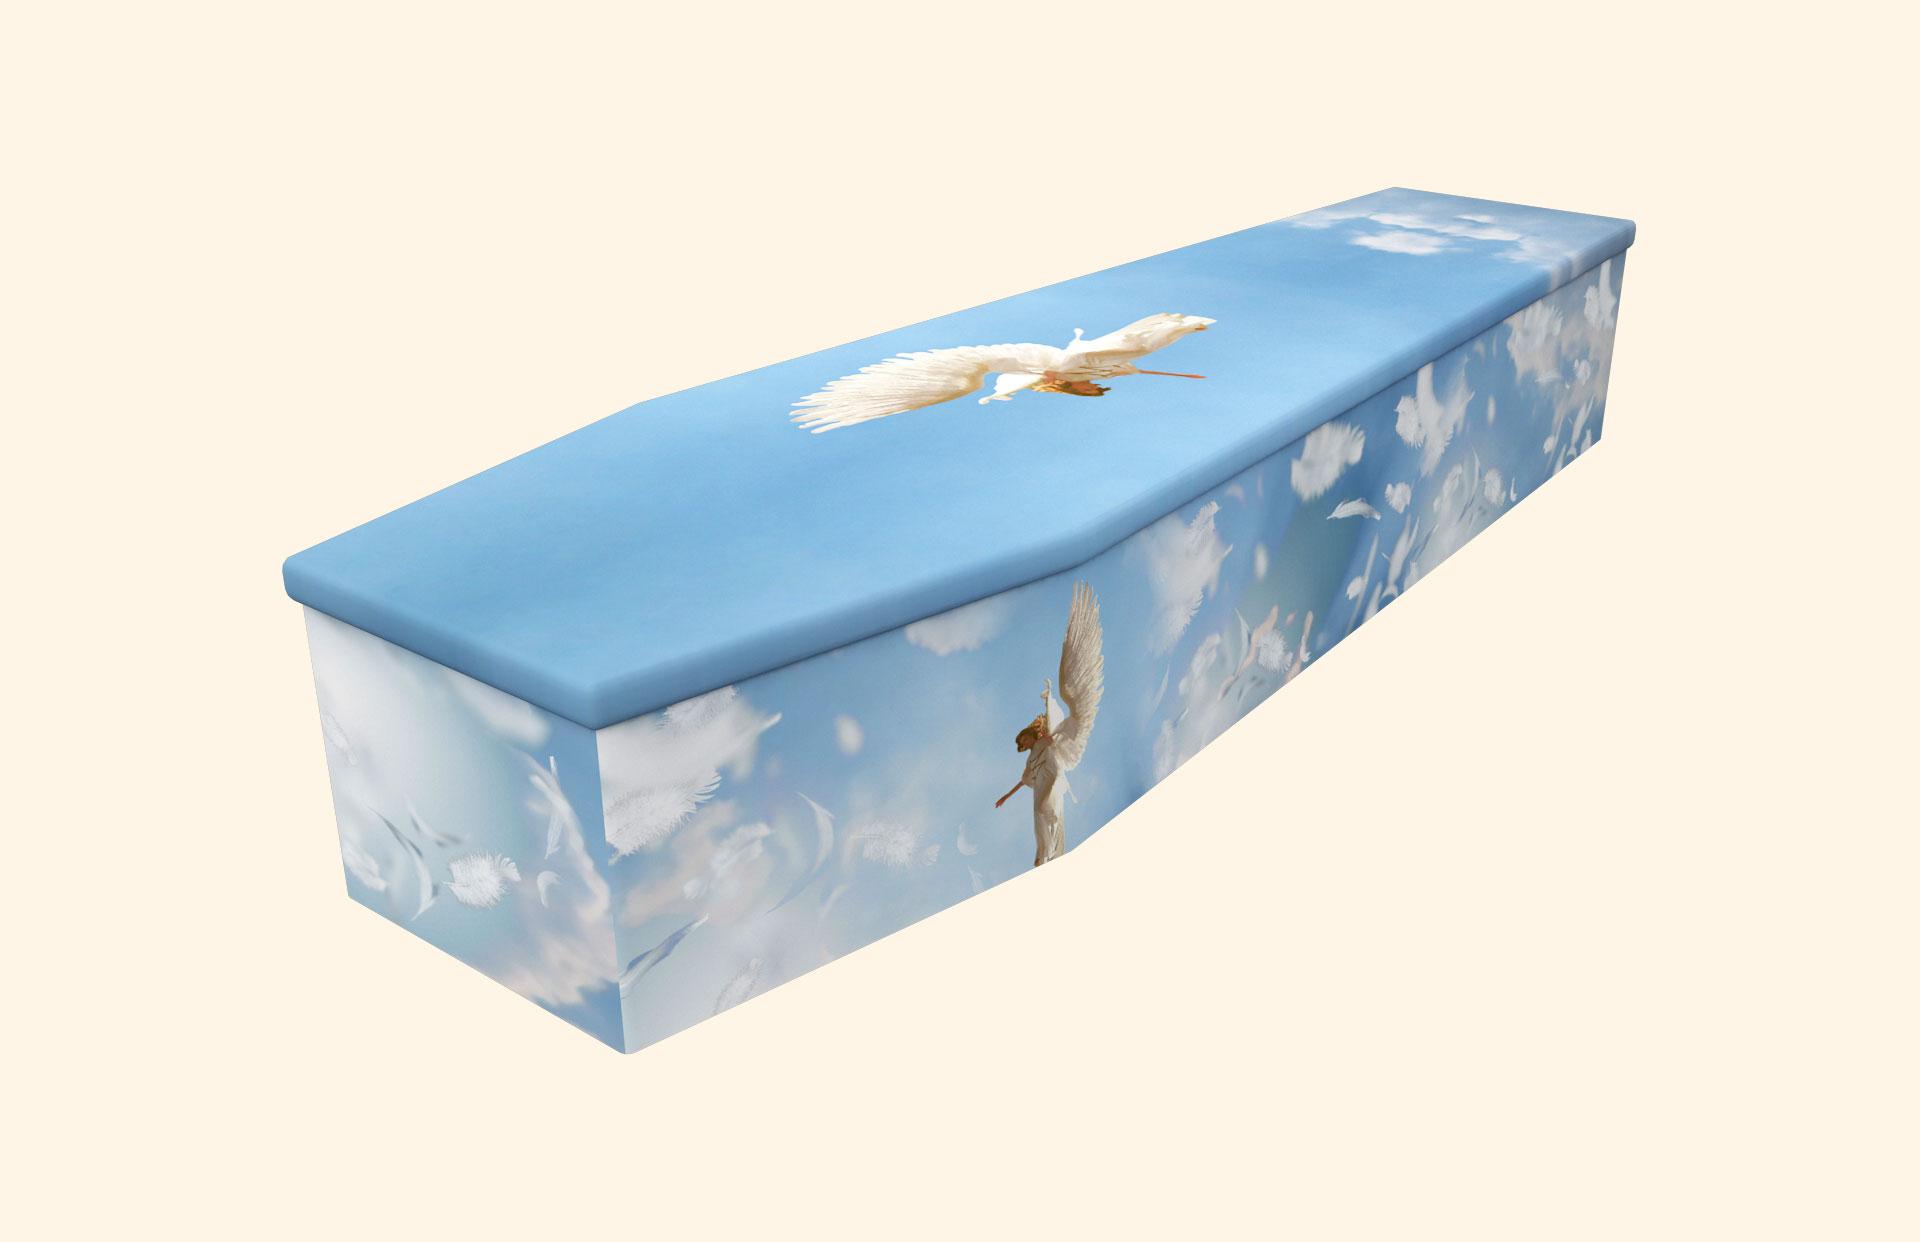 Heavenly Angel Feathers Cardboard coffin